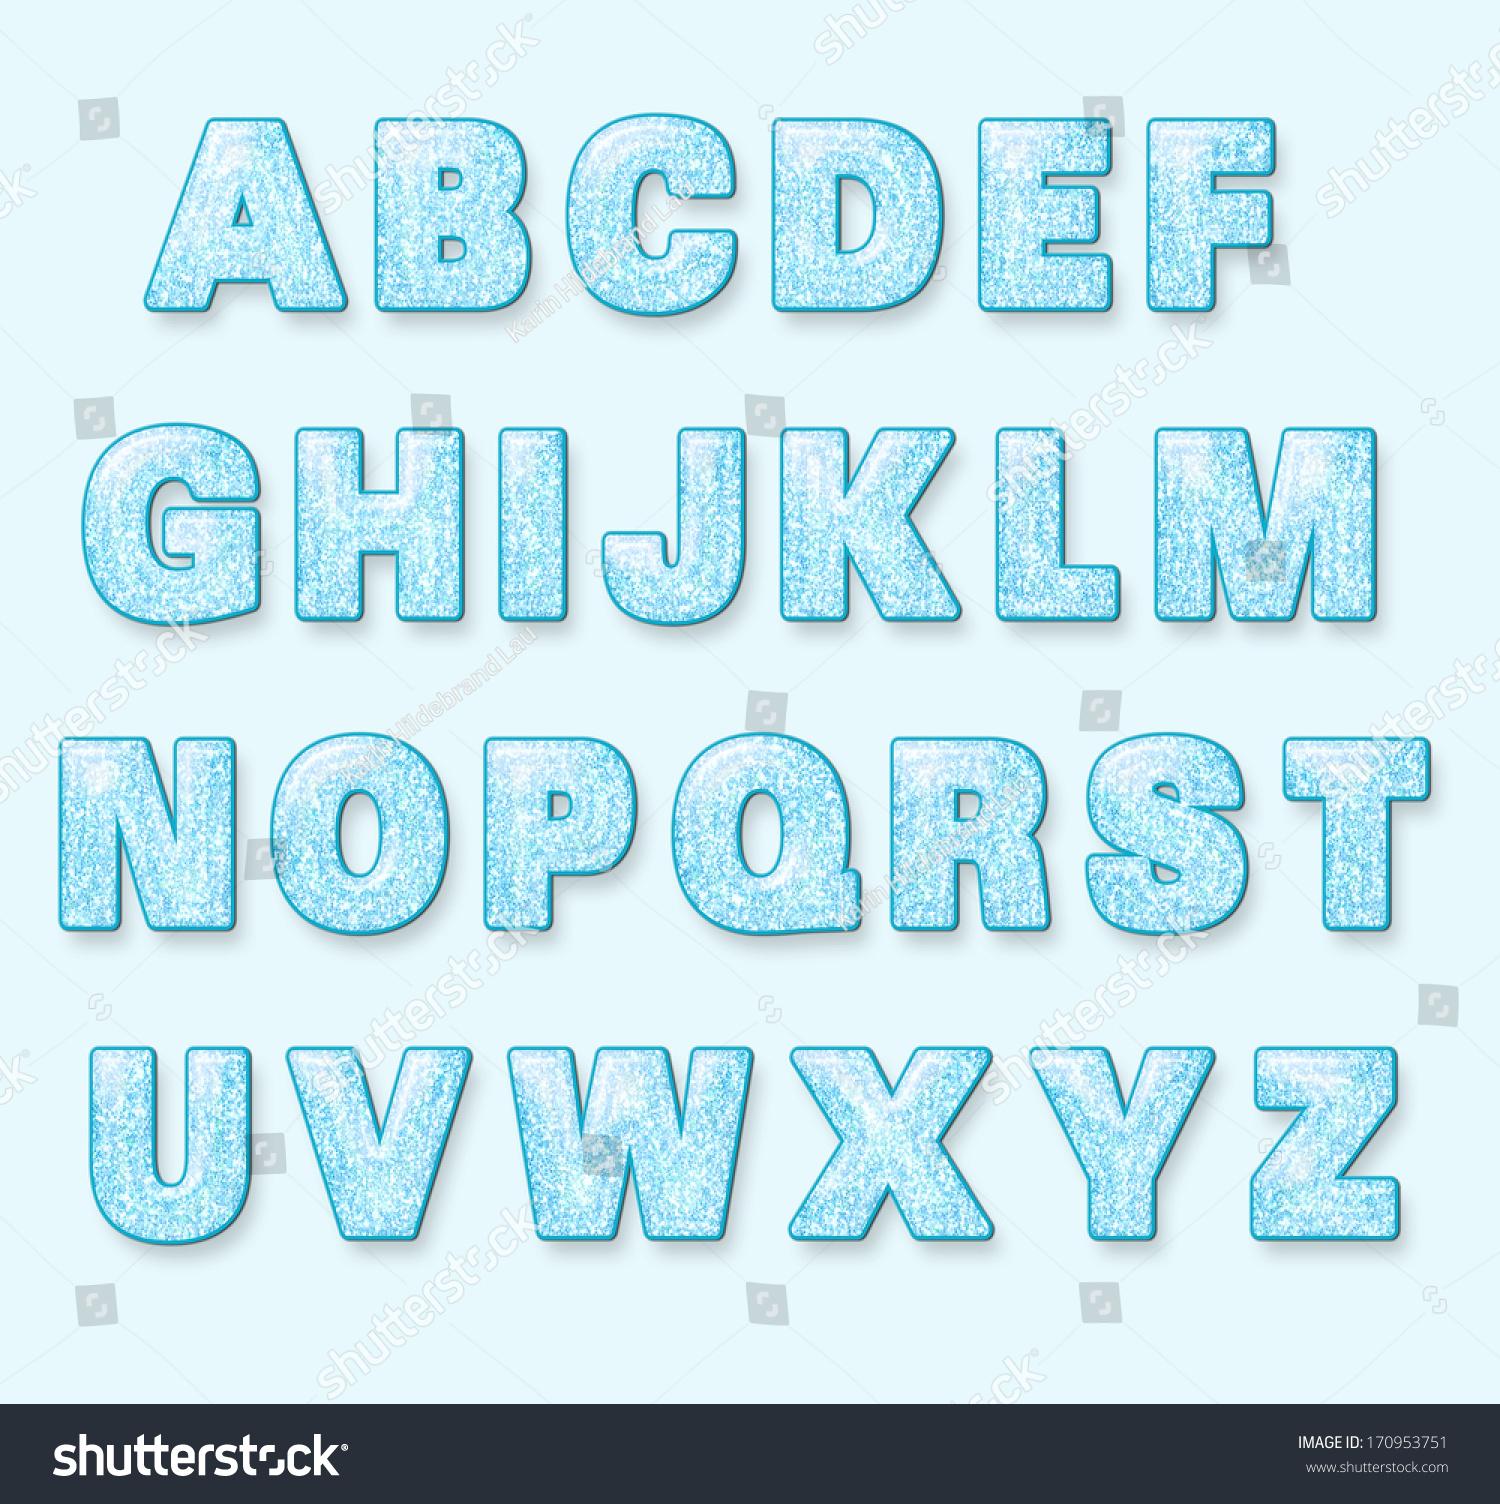 blue snowy winter font letters stock illustration. Black Bedroom Furniture Sets. Home Design Ideas